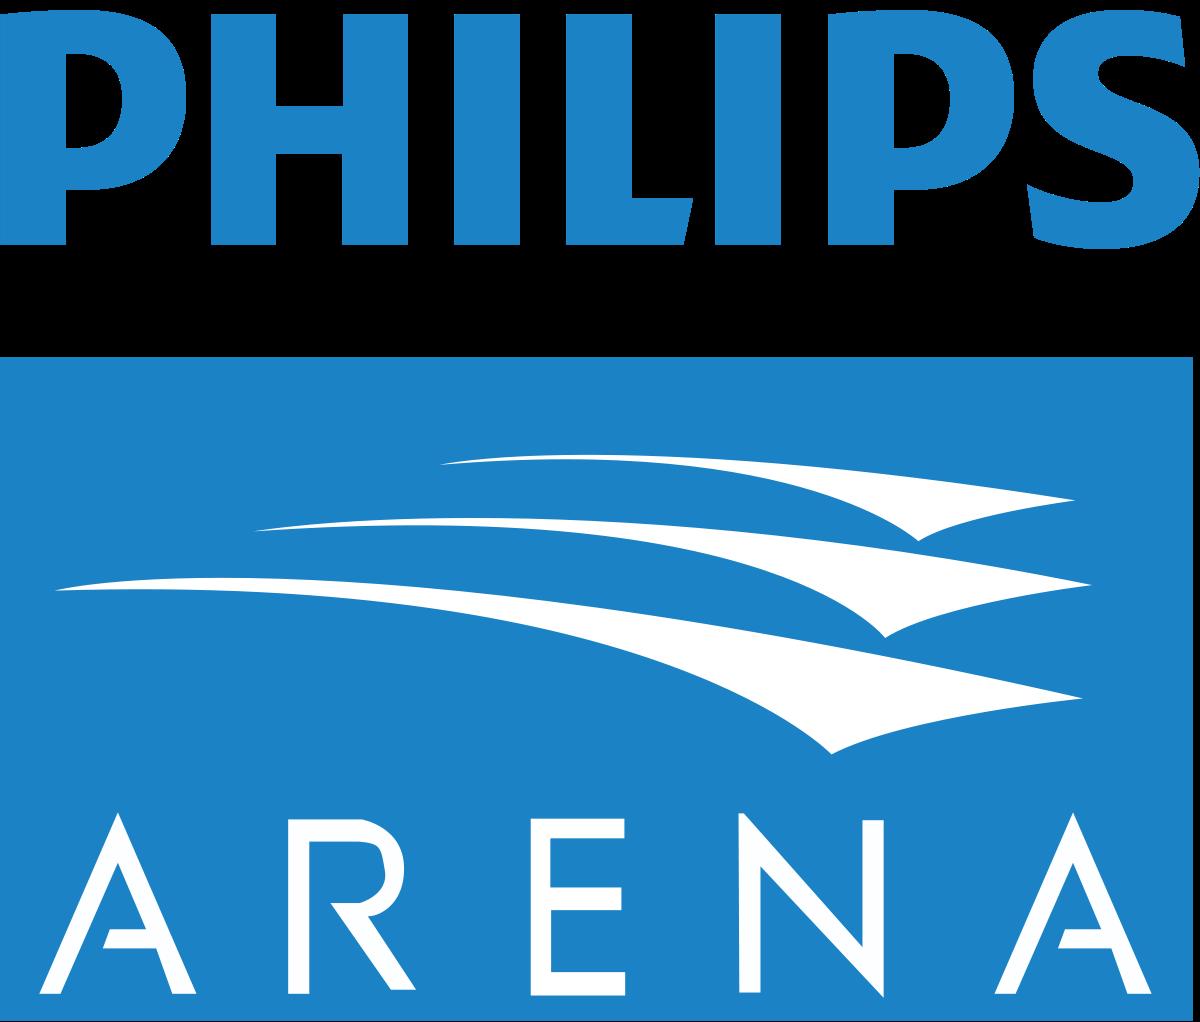 Arena Logo Png Hdpng Pluspng.com 1200   Arena Logo Png - Arena Jov Vector, Transparent background PNG HD thumbnail